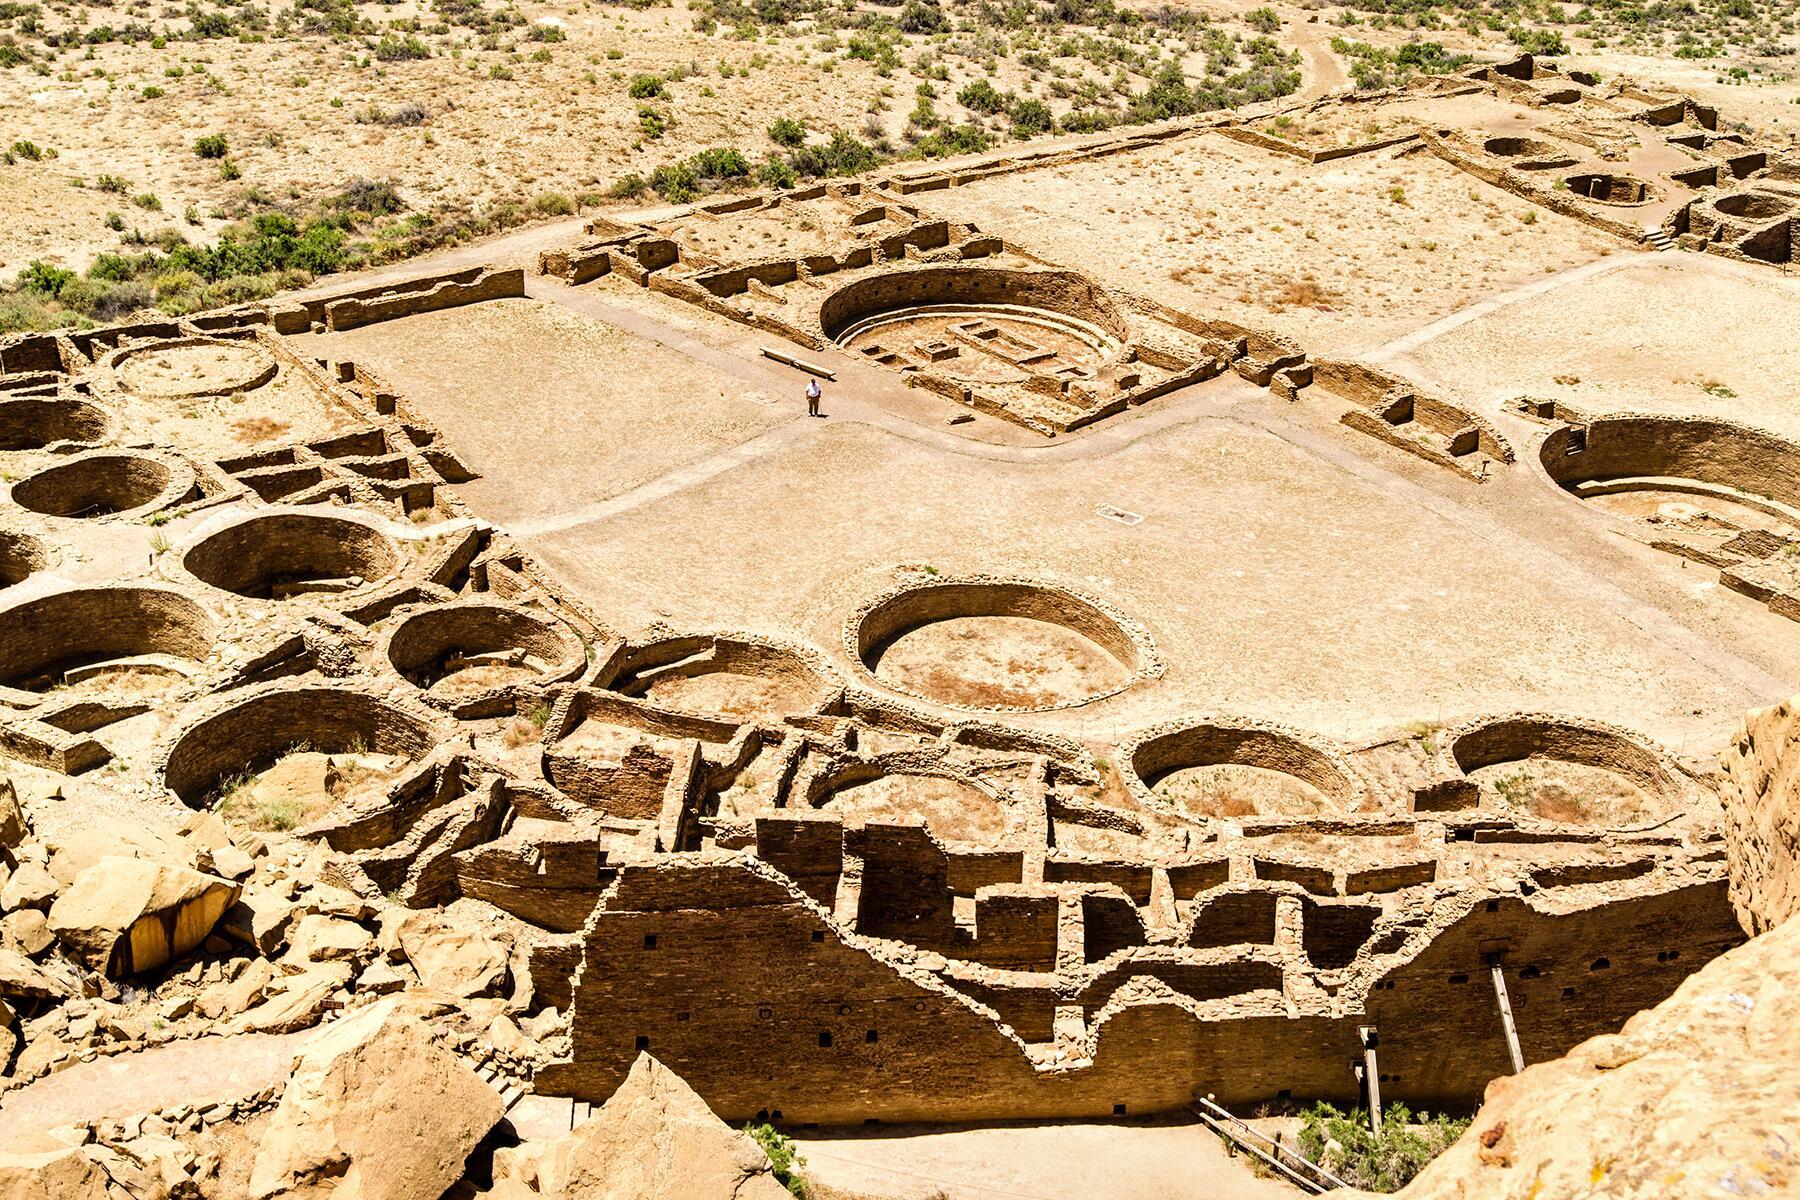 Albuquerque to Chaco Culture National Historical Park, New Mexico